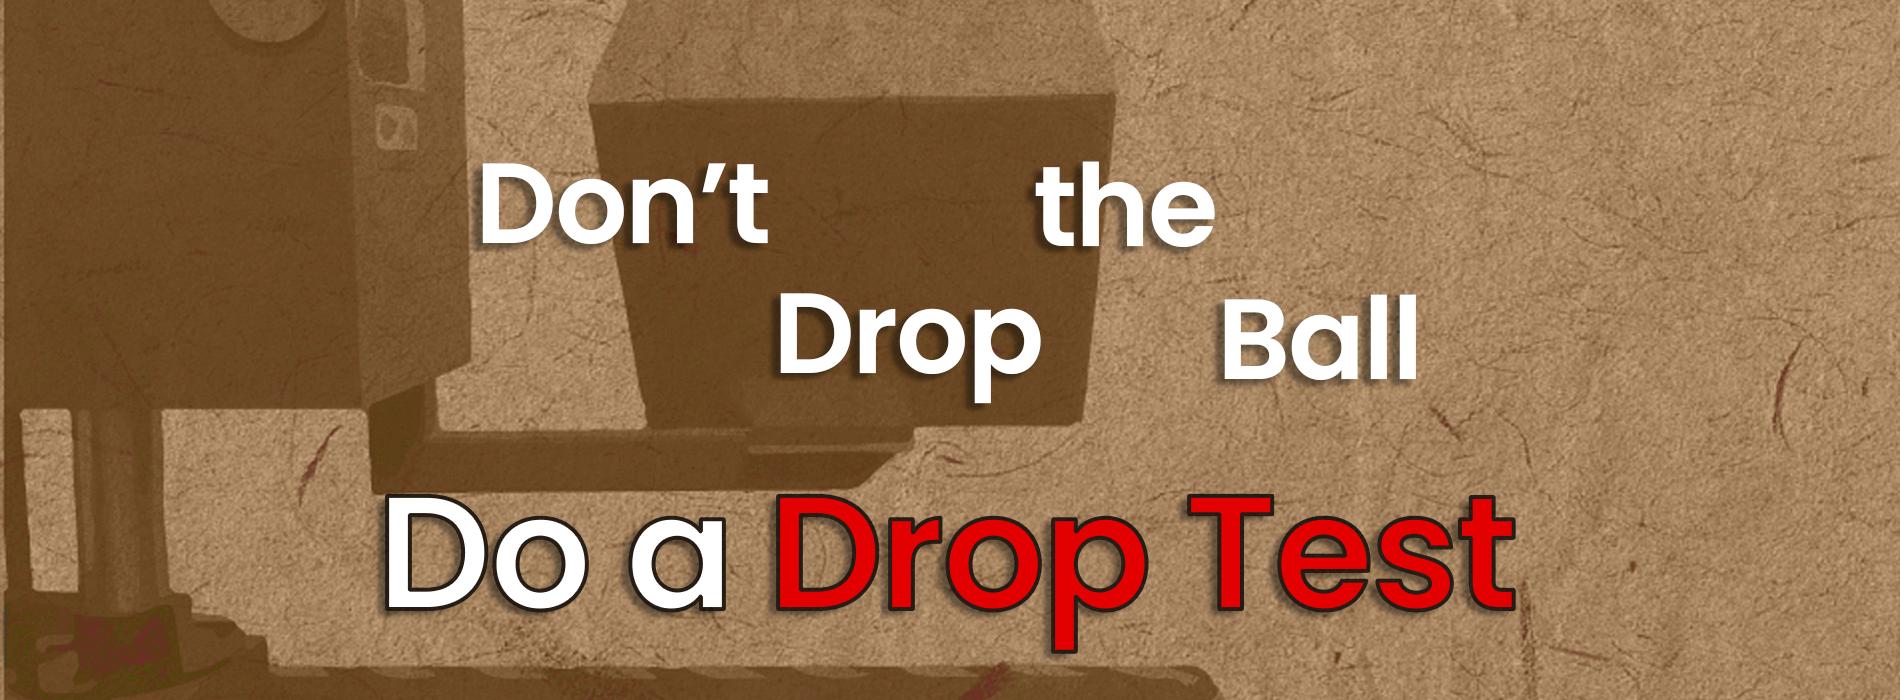 Don't Drop the Ball, Do a Drop Test